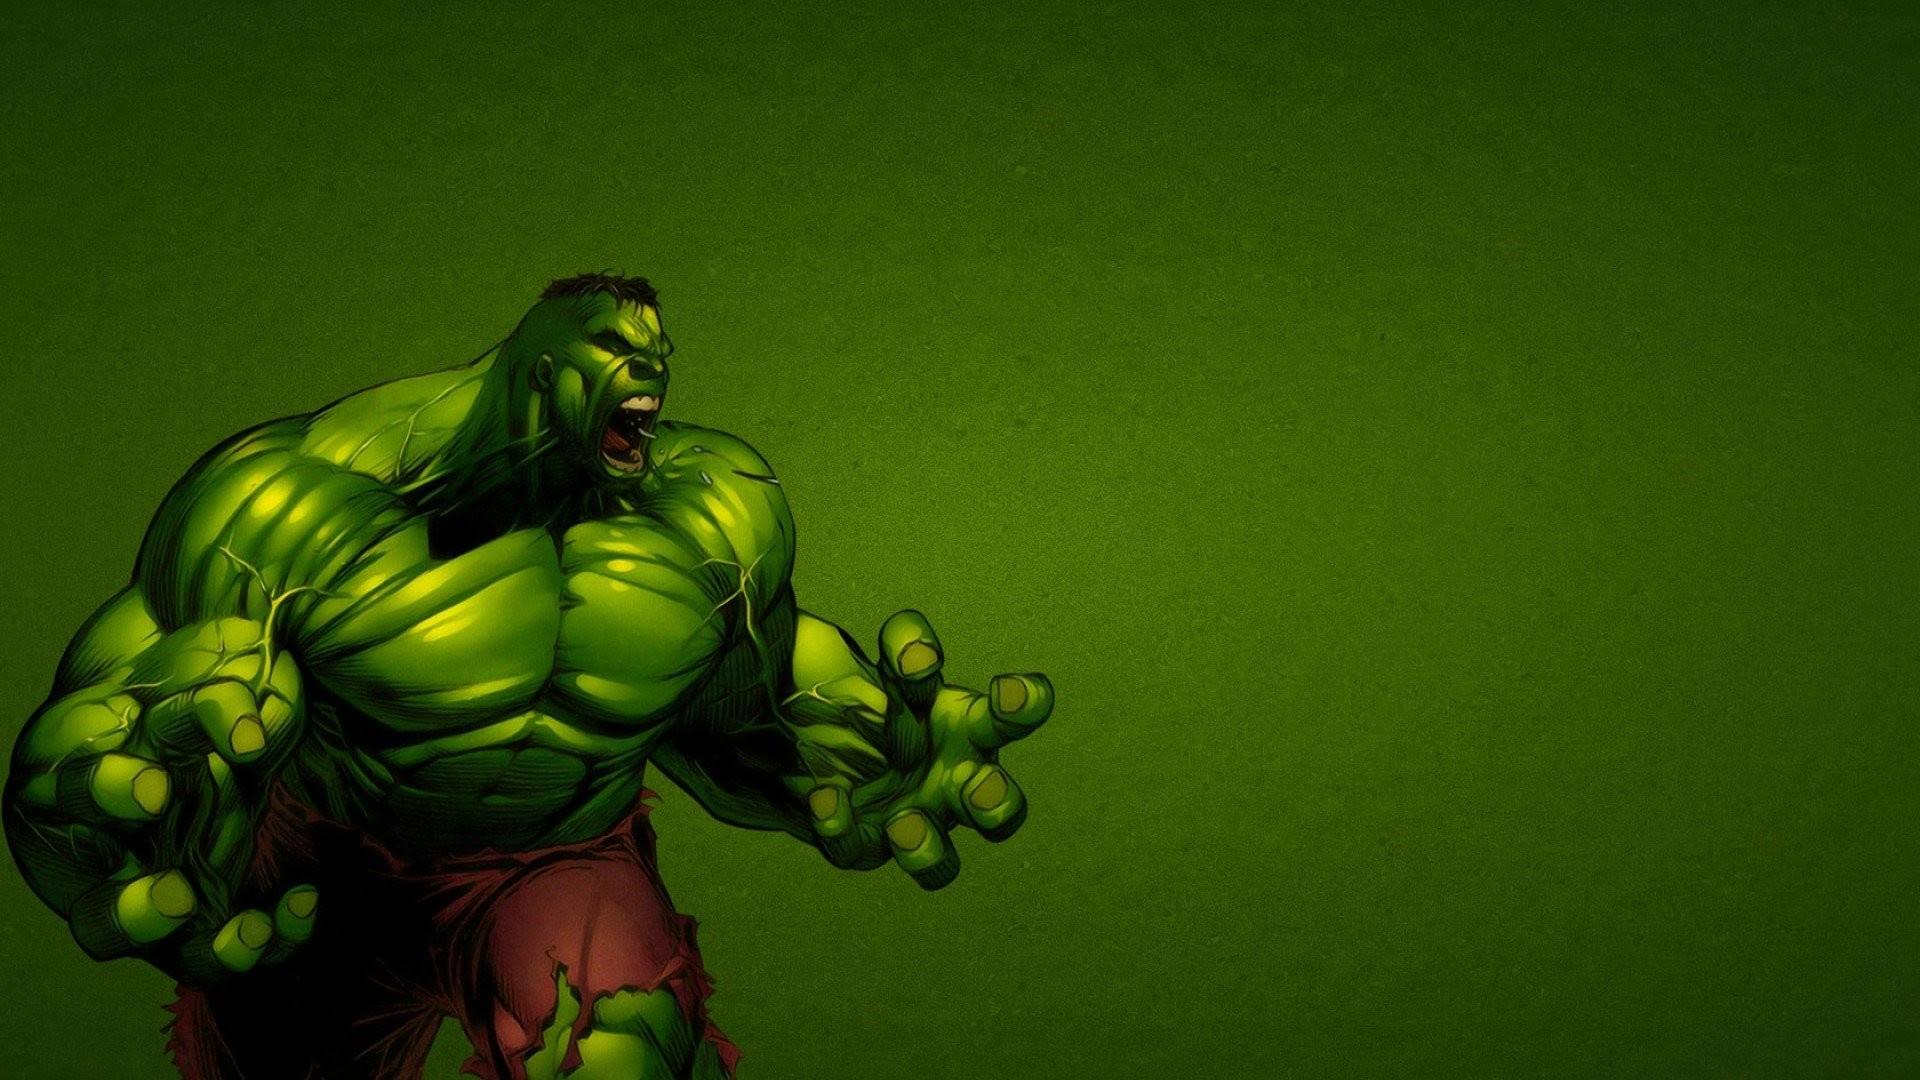 Hd Hulk Wallpaper 74 Images